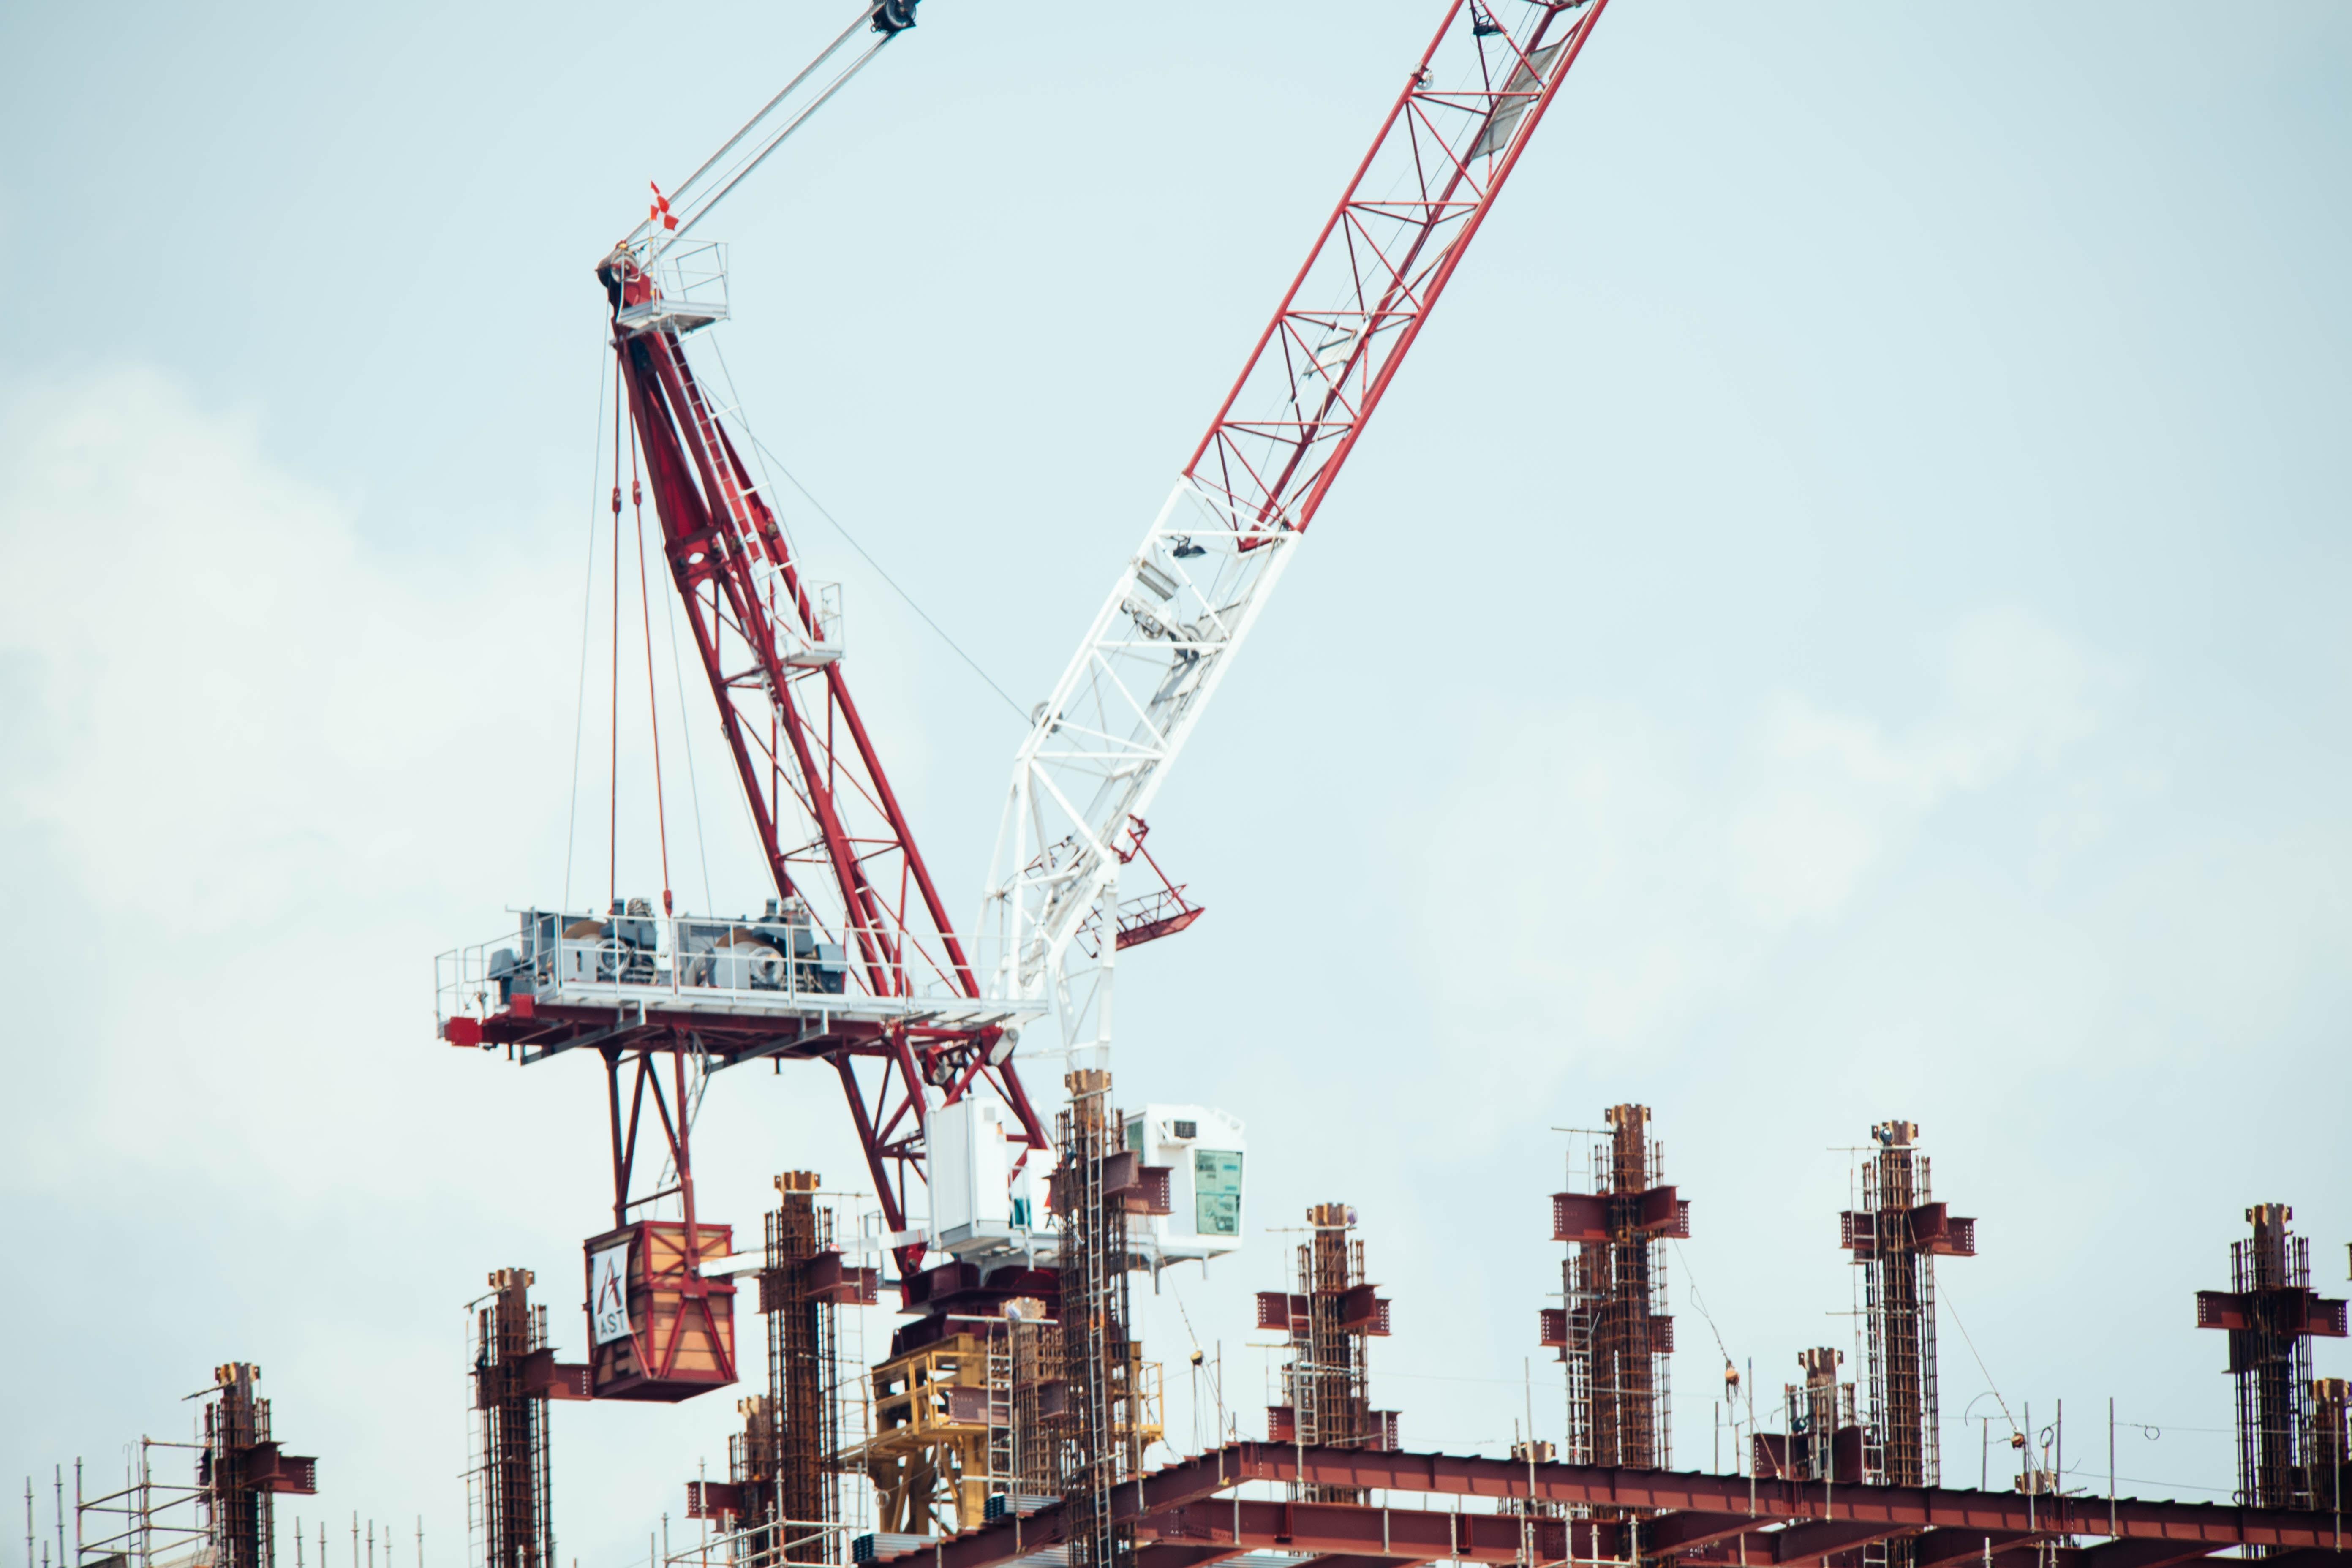 crane lifting an equipment